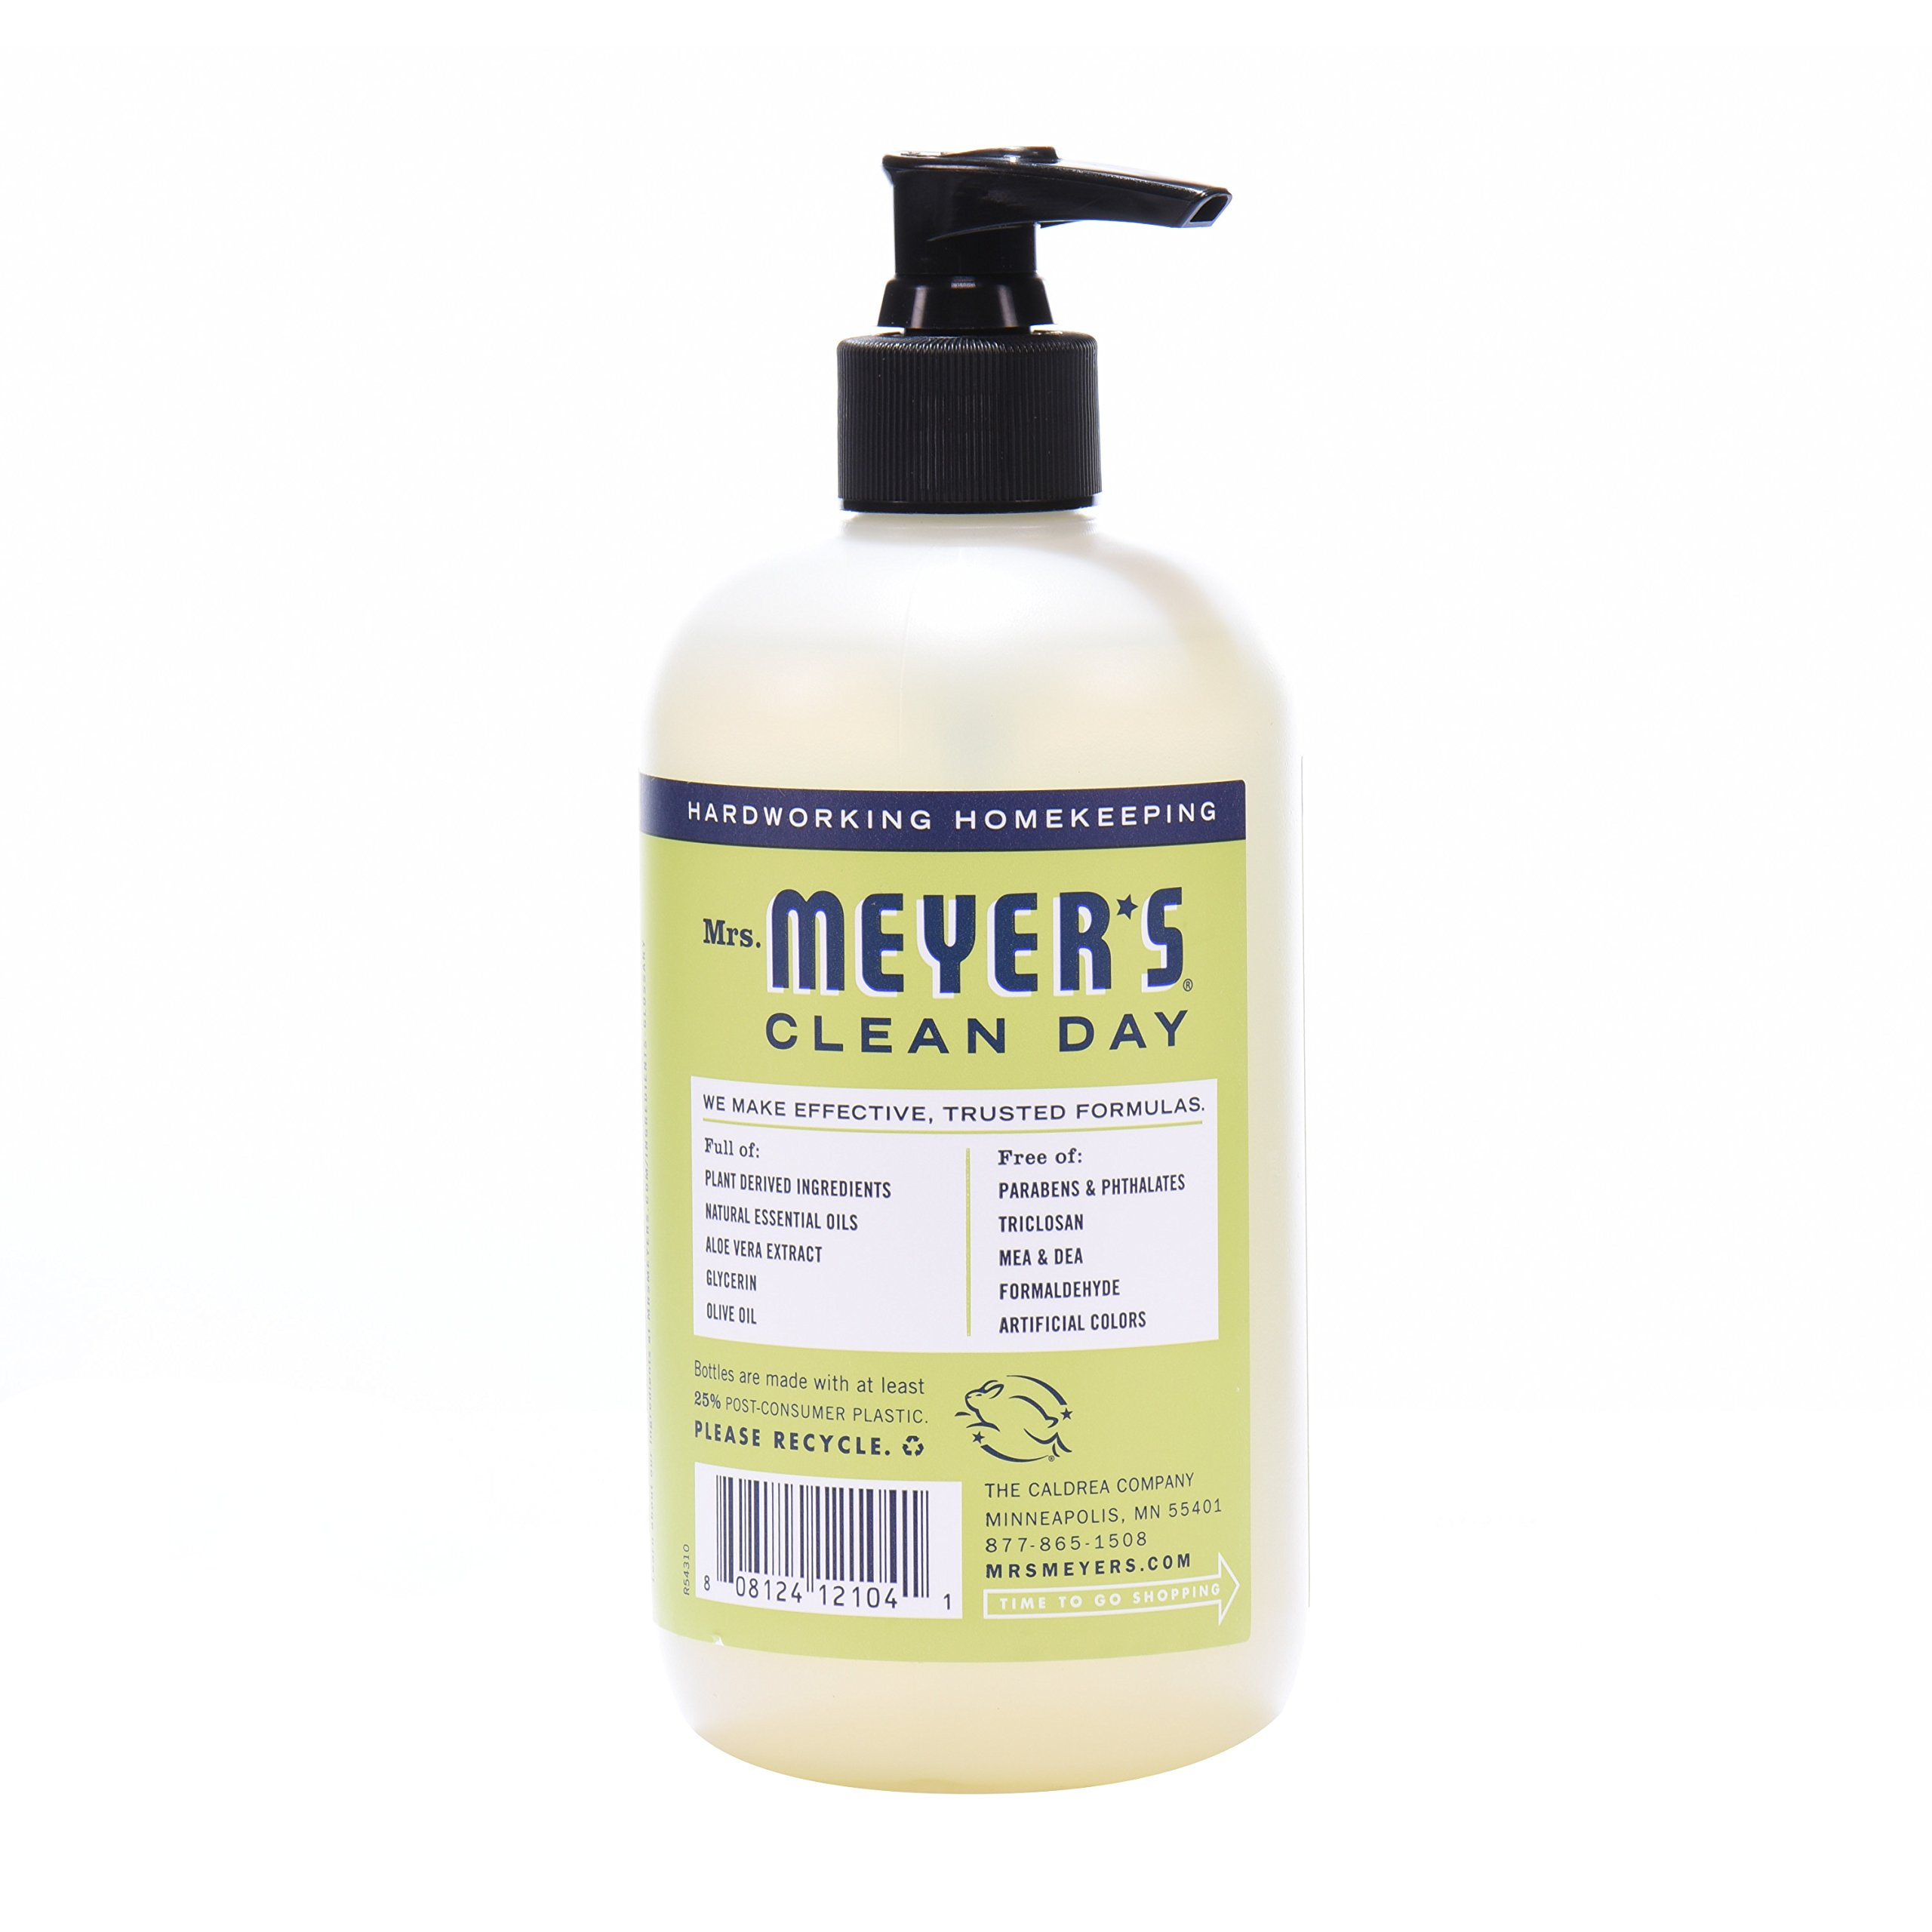 Mrs. Meyer's Clean Day Kitchen Basics Set, Lemon Verbena, 3 ct: Dish Soap (16 fl oz), Hand Soap (12.5 fl oz), Multi-Surface Everyday Cleaner (16 fl oz) by Mrs. Meyer's Clean Day (Image #9)